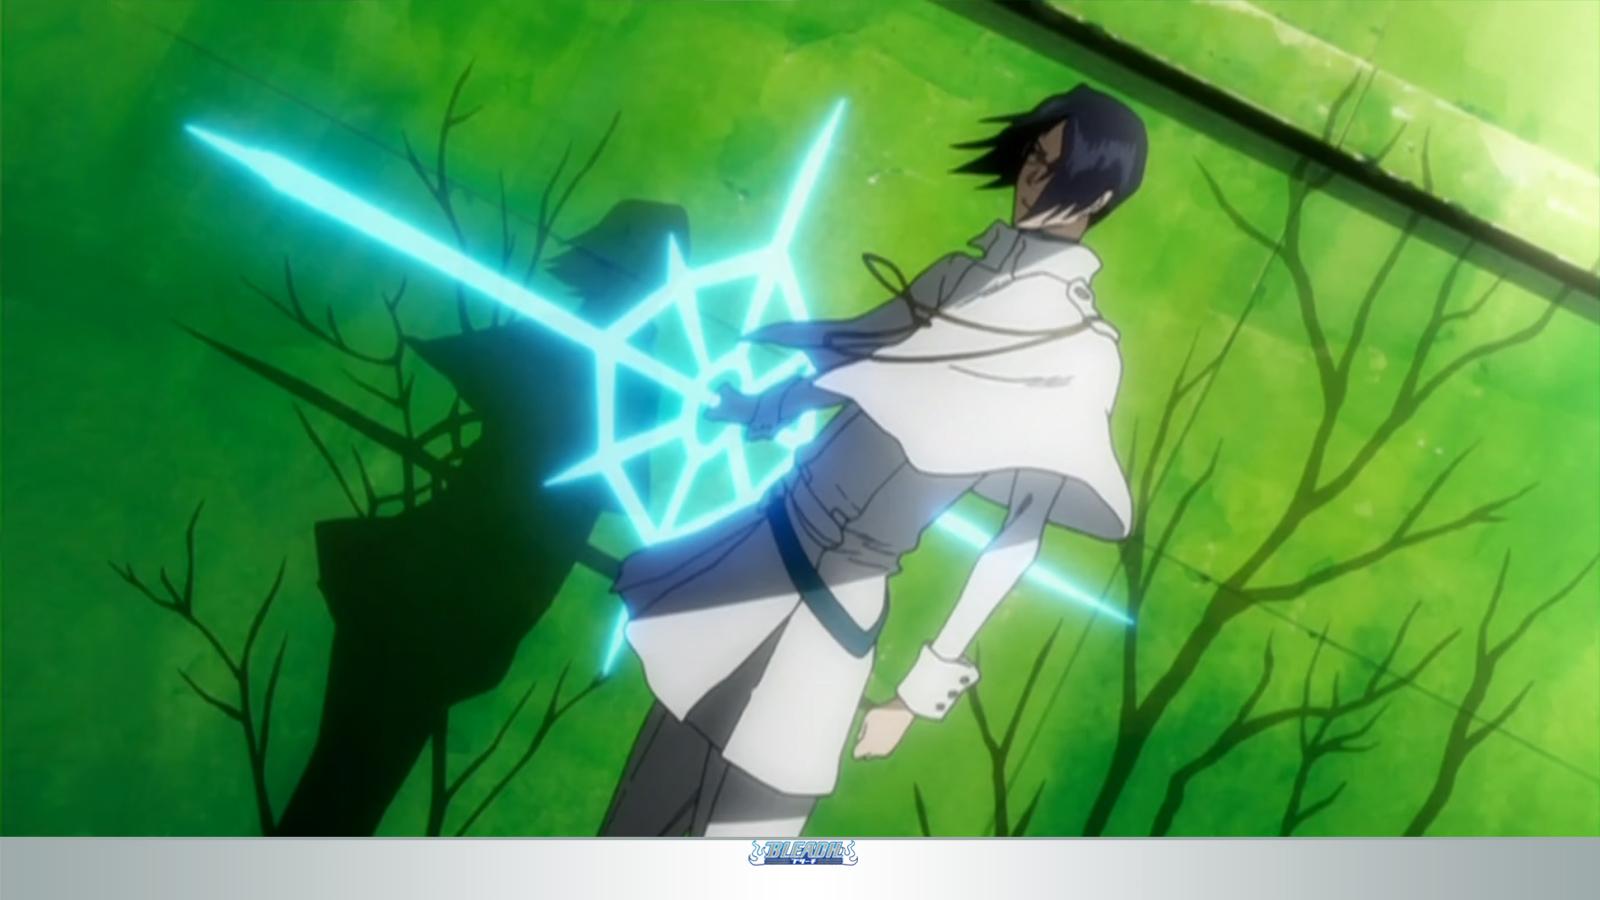 Uryu Ishida Bow Ishida Uryu by Phantom cz